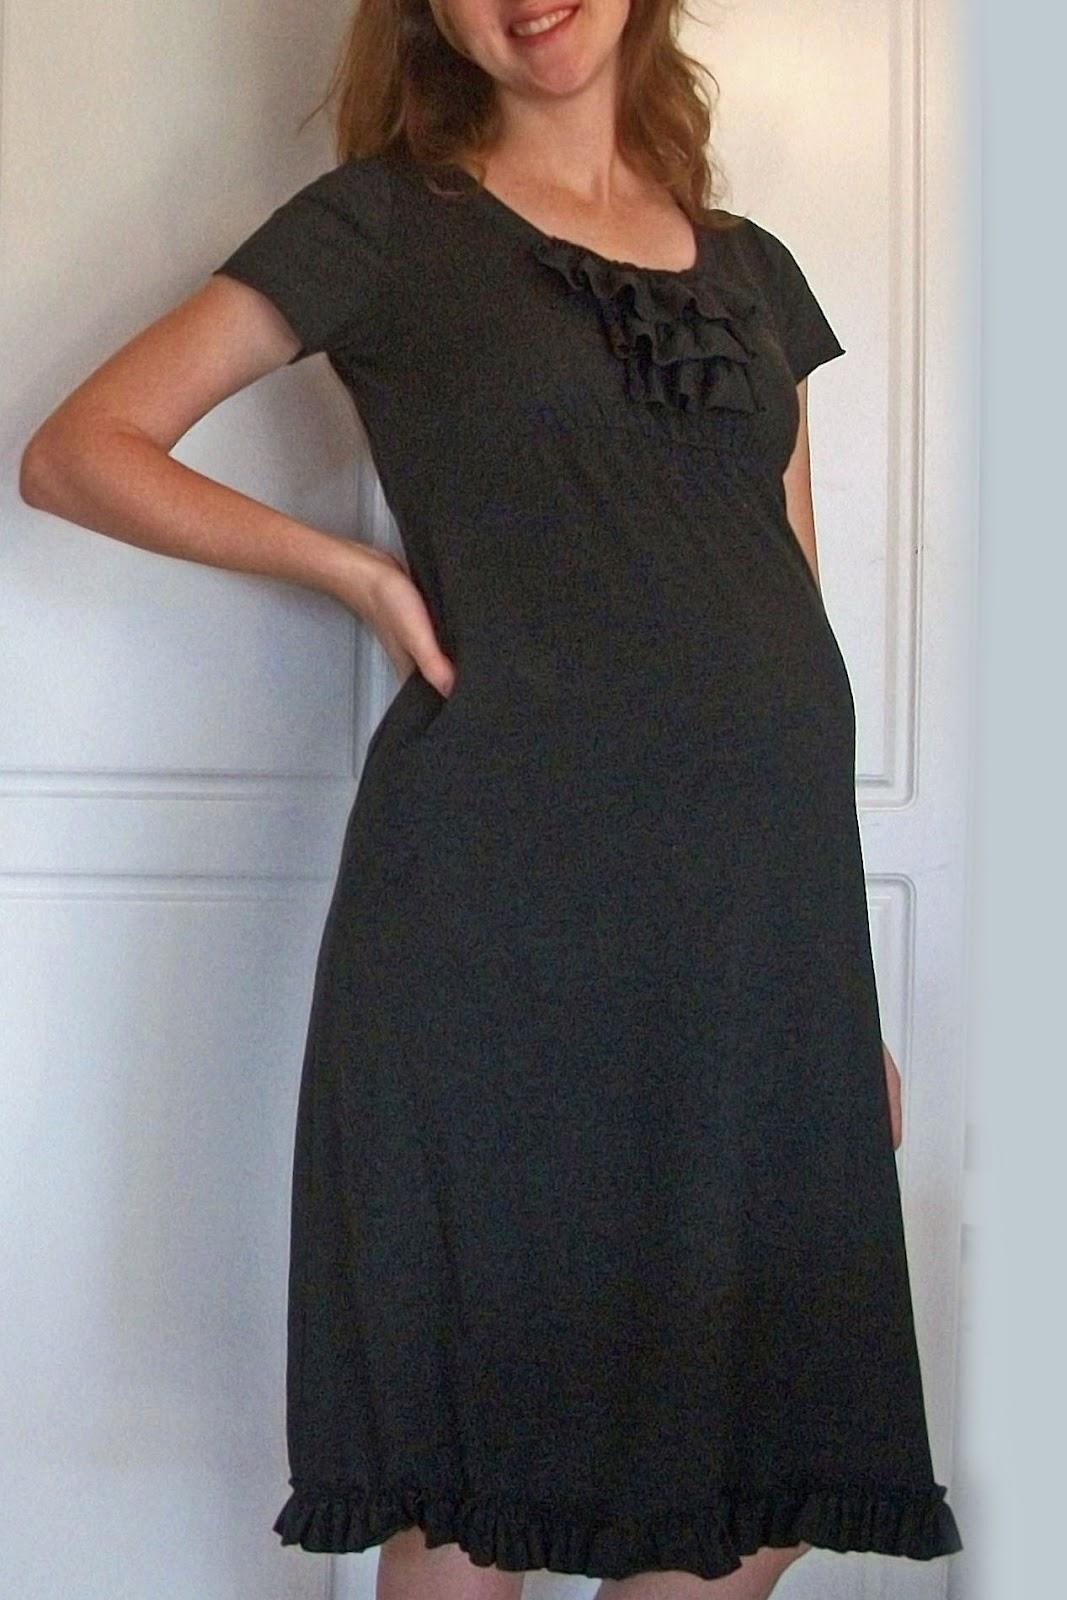 Idea bottle easy diy ruffle top dress tutorial my maternity dress idea bottle easy diy ruffle top dress tutorial my maternity dress makeover ombrellifo Choice Image